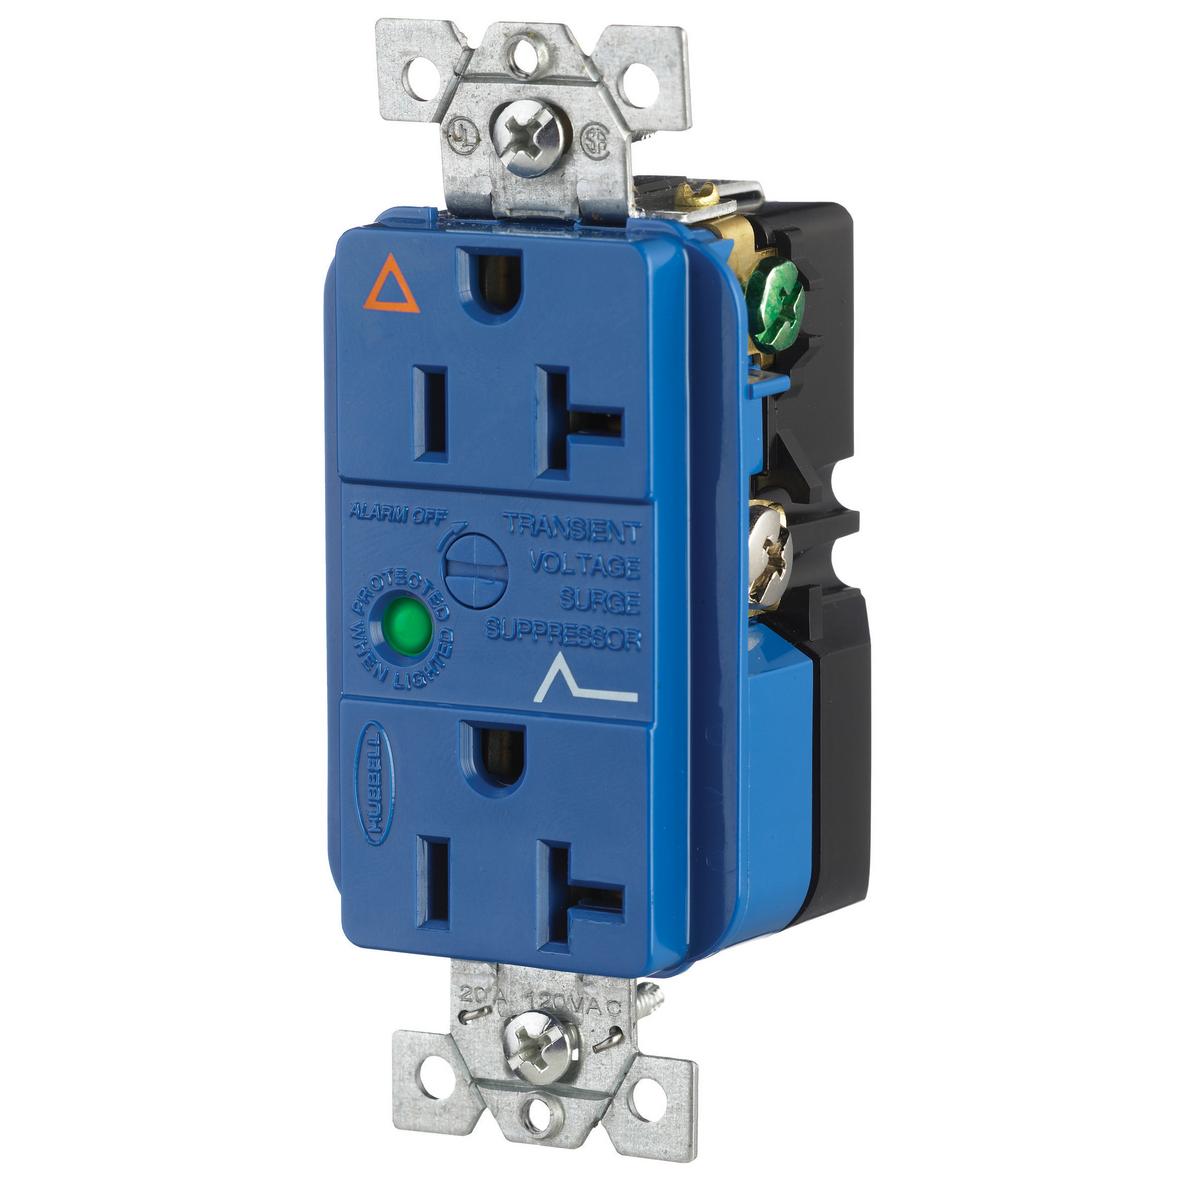 Hubbell IG5362SA 20 Amp 125 Volt 2-Pole 3-Wire NEMA 5-20R Blue Duplex Surge Suppression Receptacle